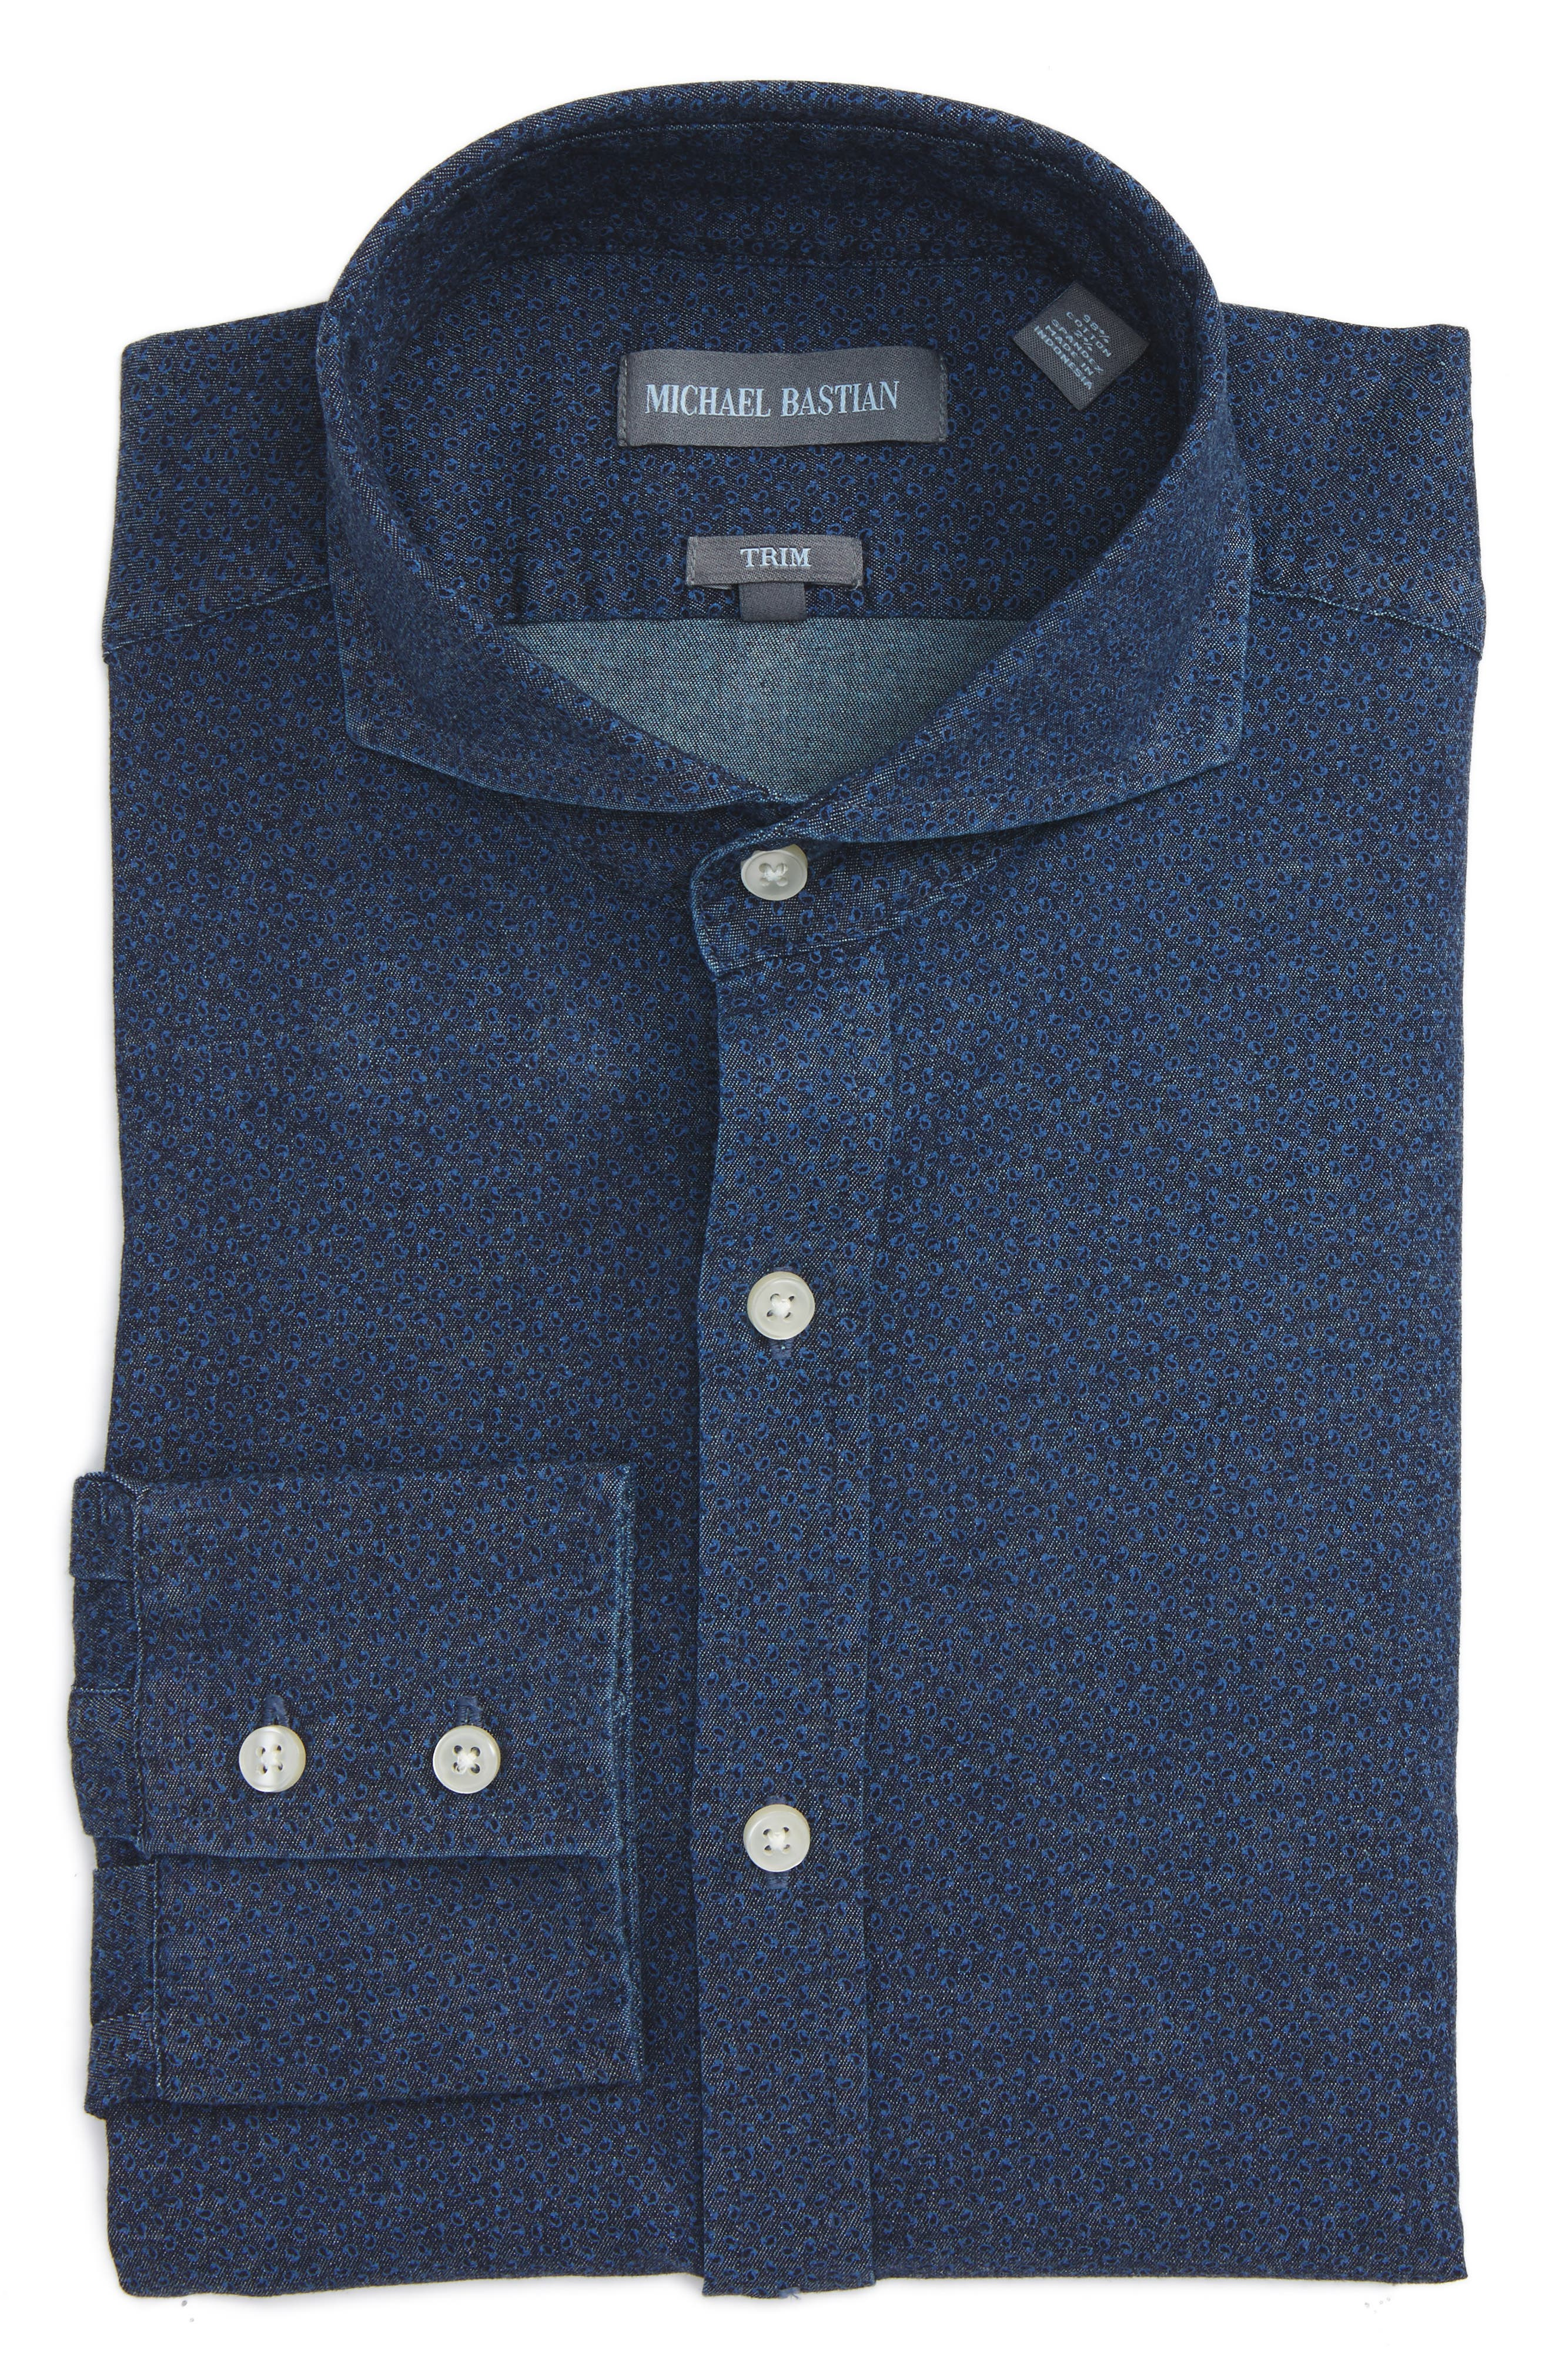 Main Image - Michael Bastian Trim Fit Cotton Twill Dress Shirt